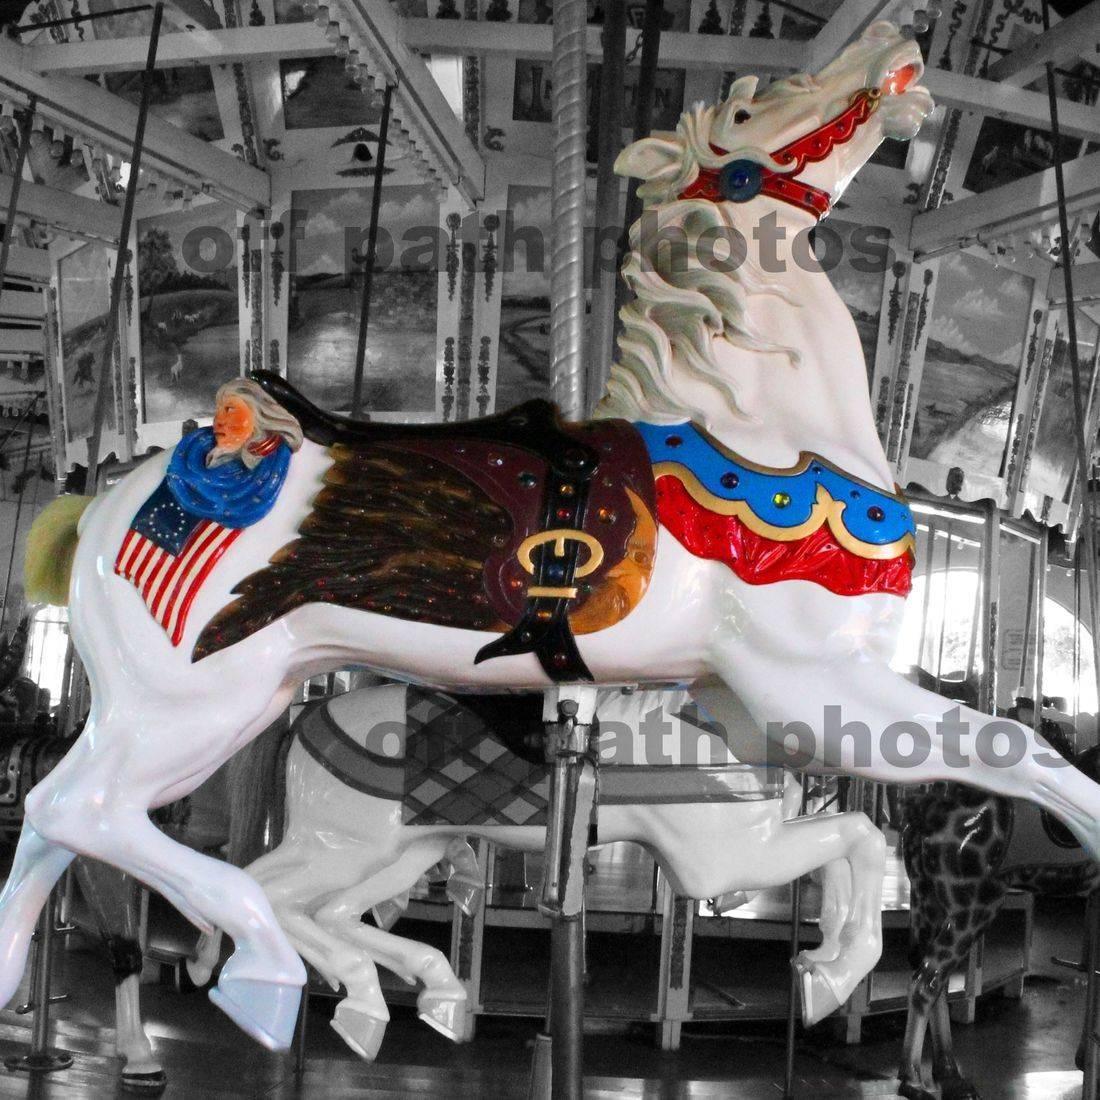 photography, merry-go-round, carousel, horses, patriotic, amusement ride